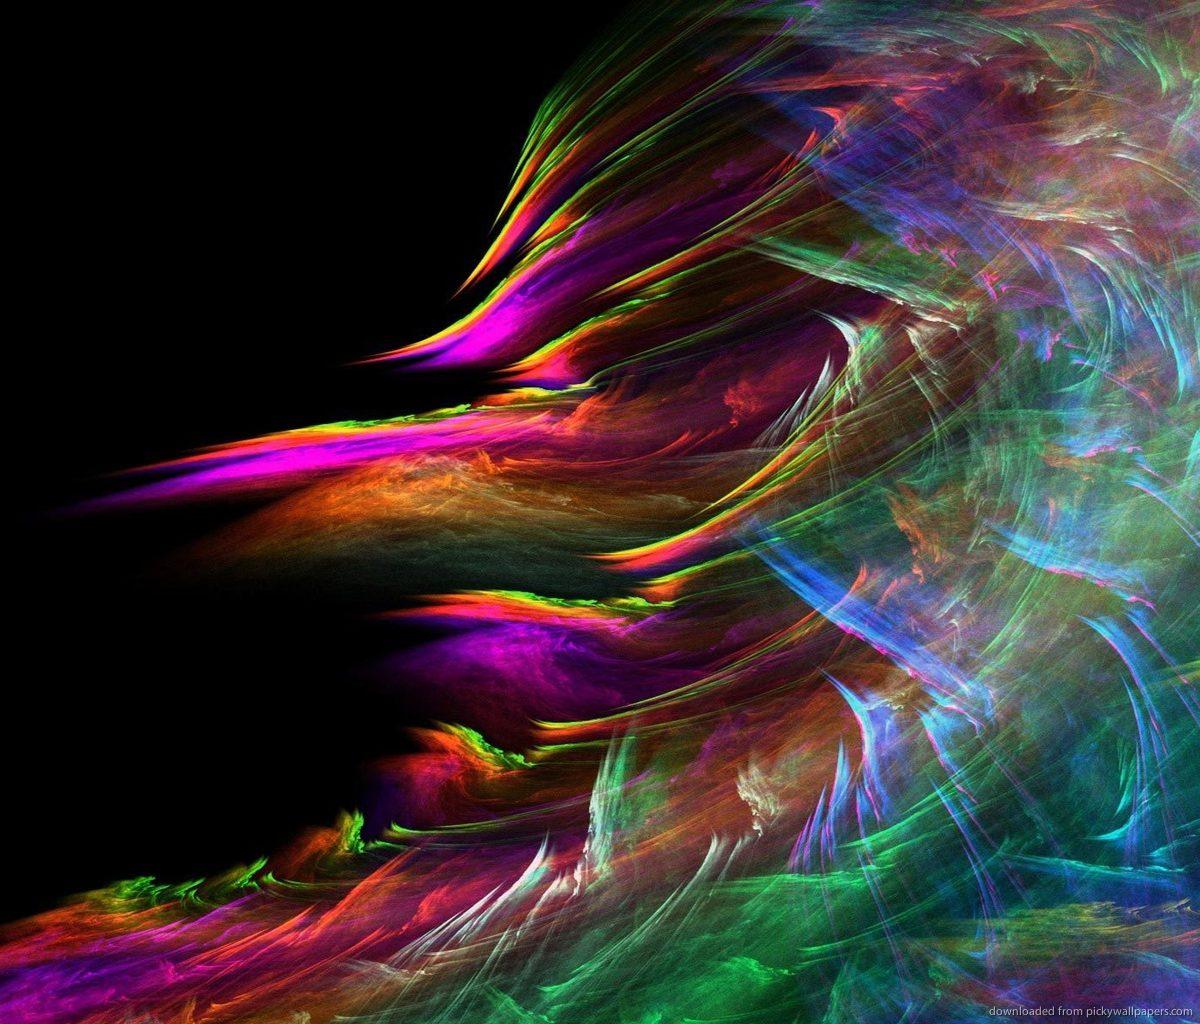 Download Windstorm Fractal HD Wallpaper For Samsung Galaxy Tab 1200x1024